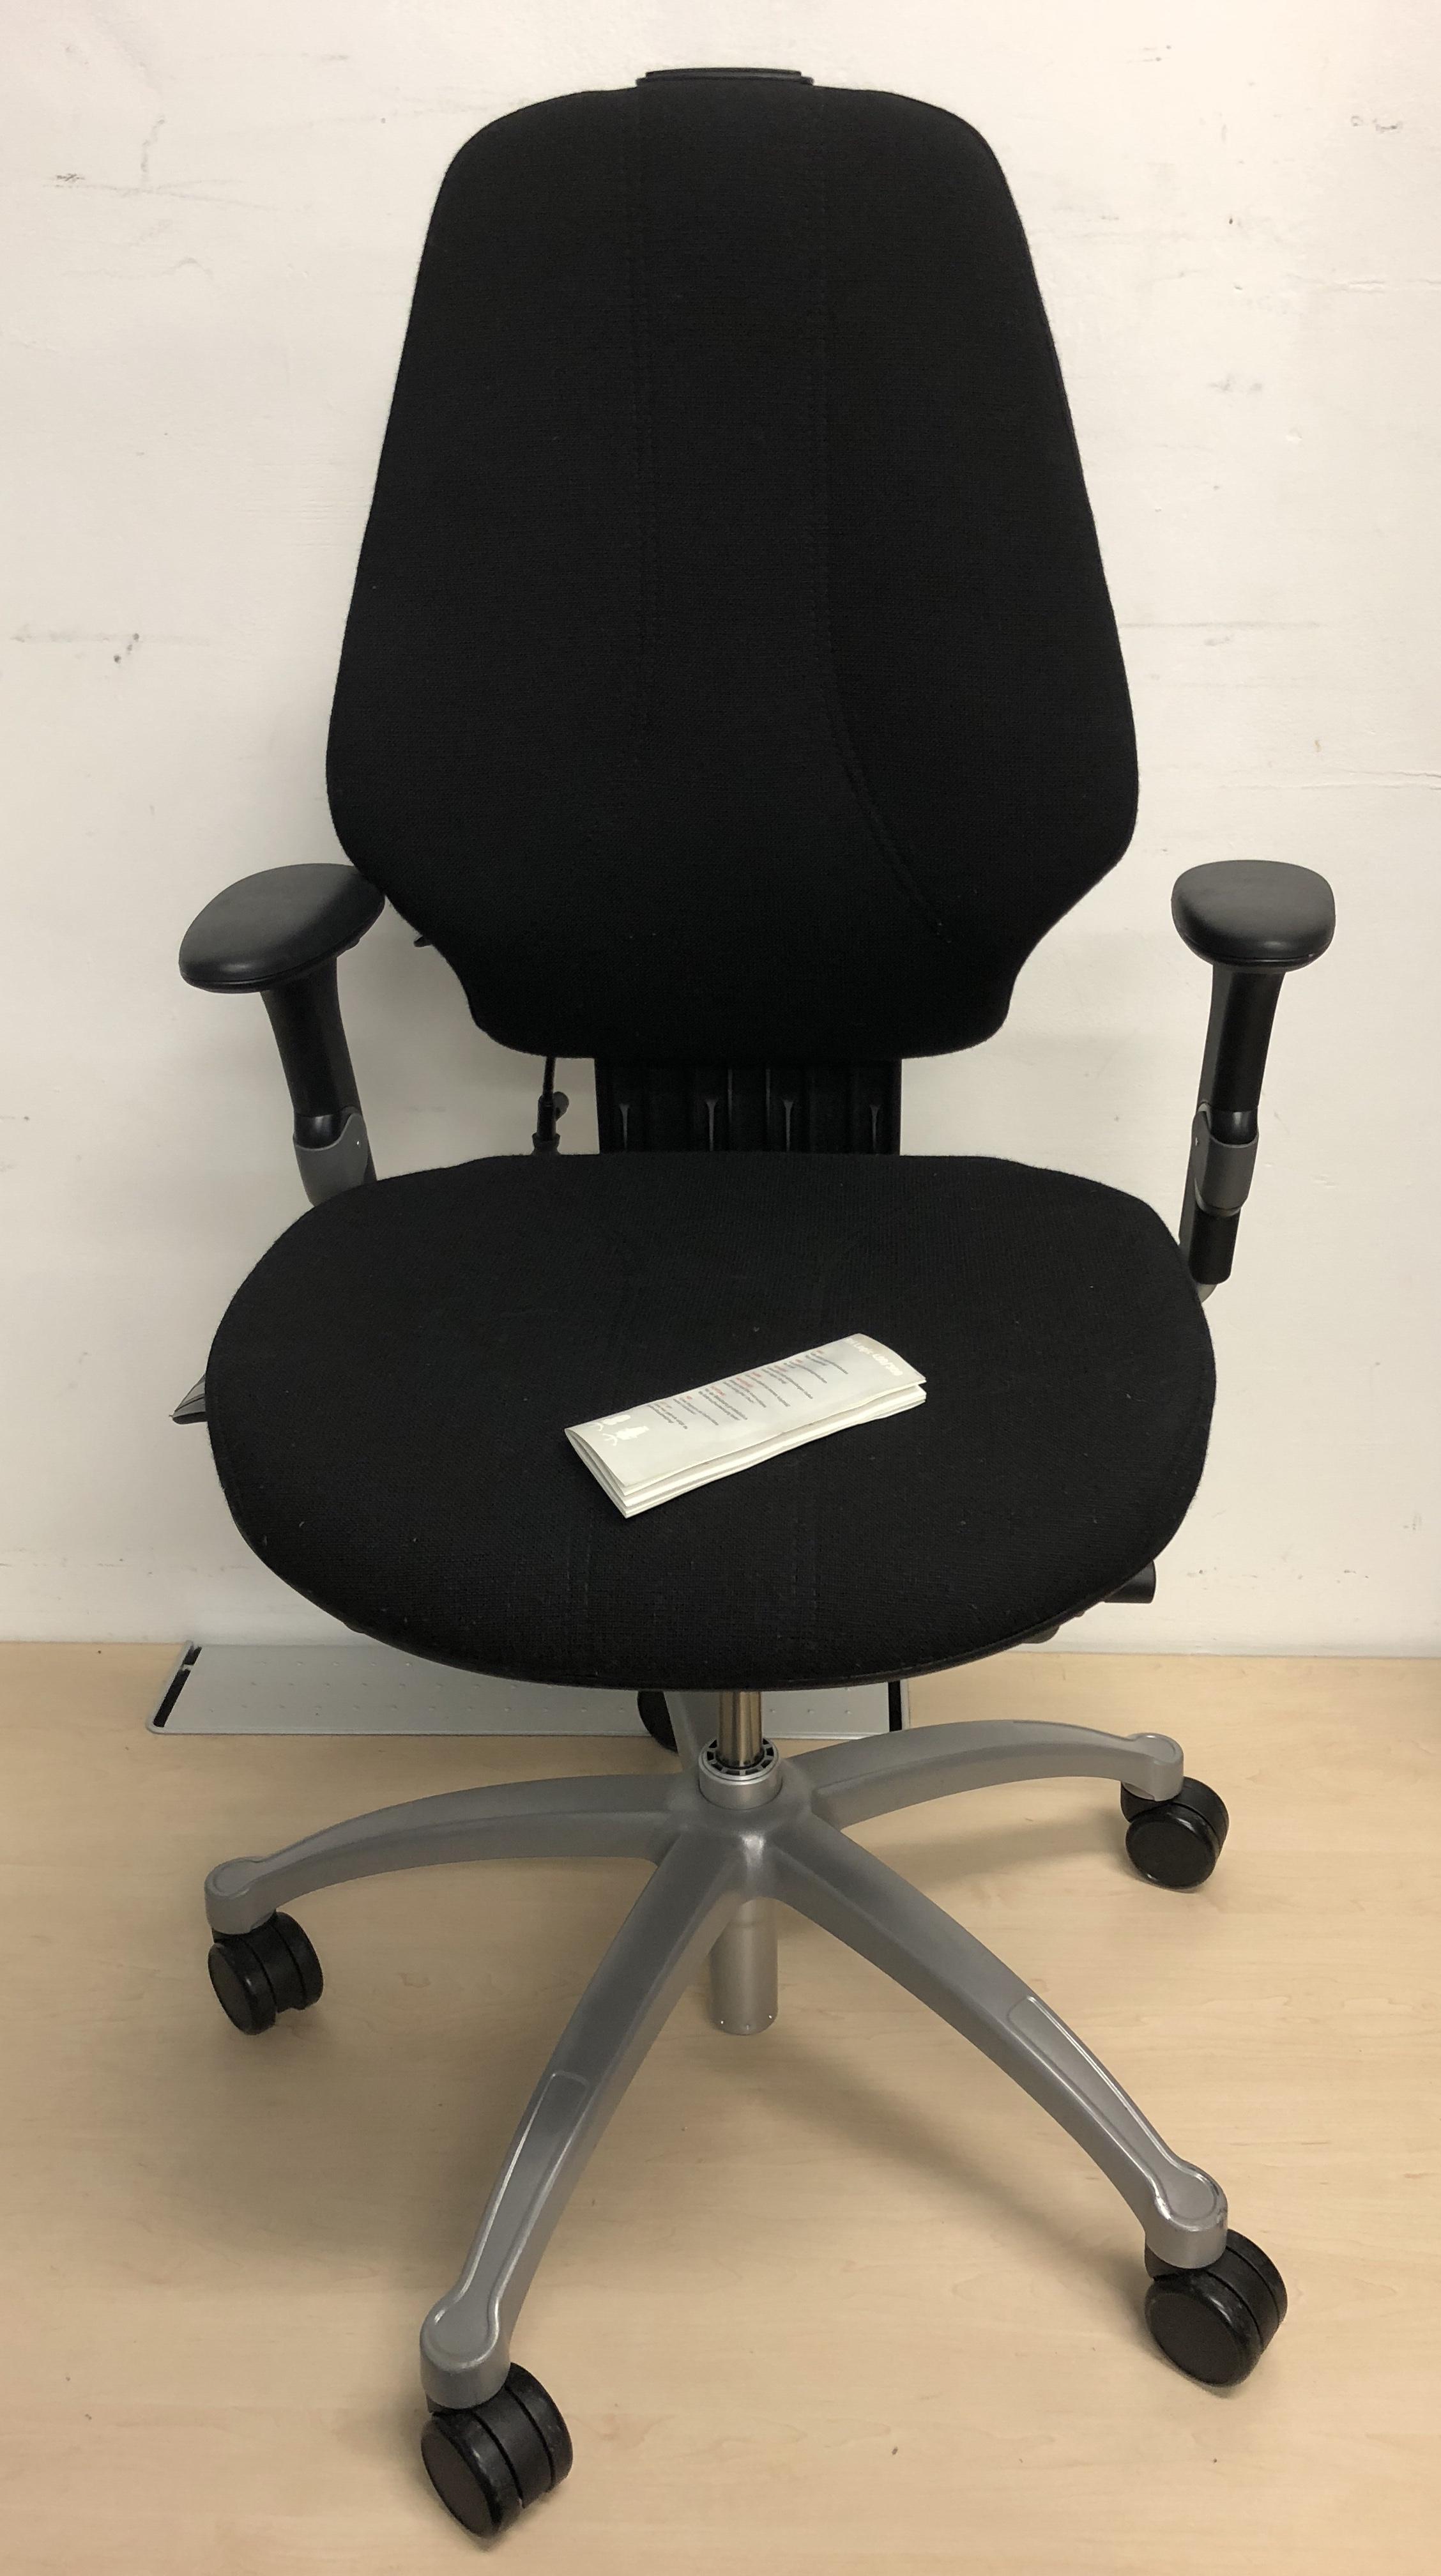 Rh Logic 300 Ergonomic Orthopaedic Office Chair